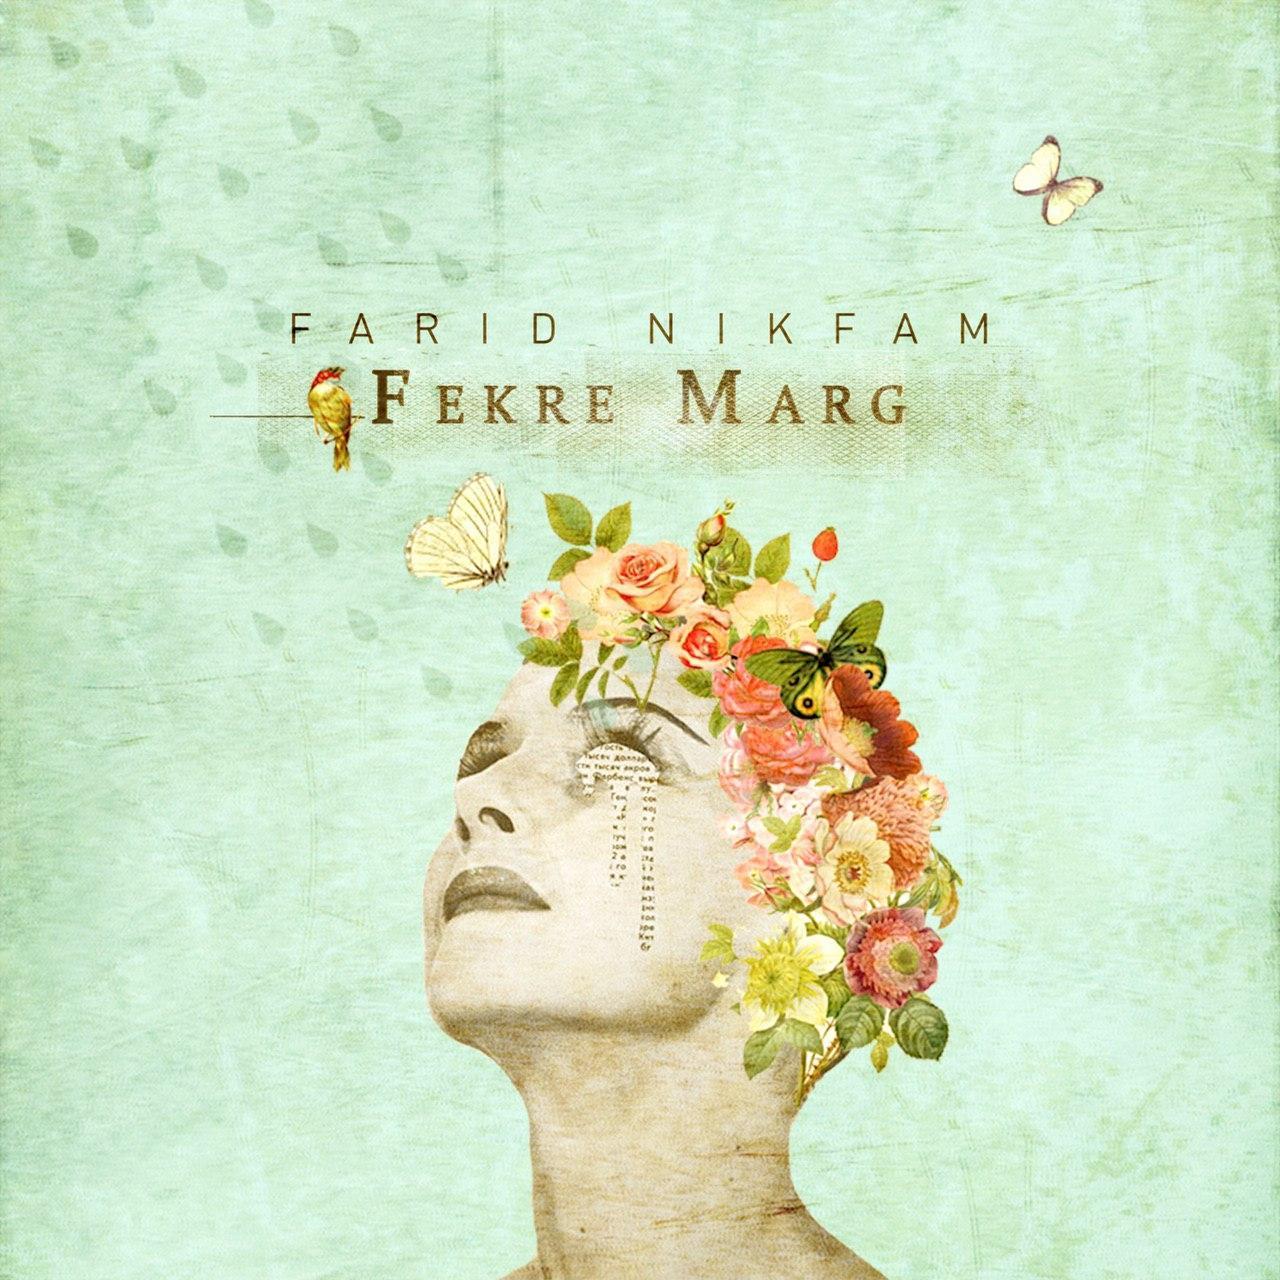 Farid Nikfam – Fekre Marg